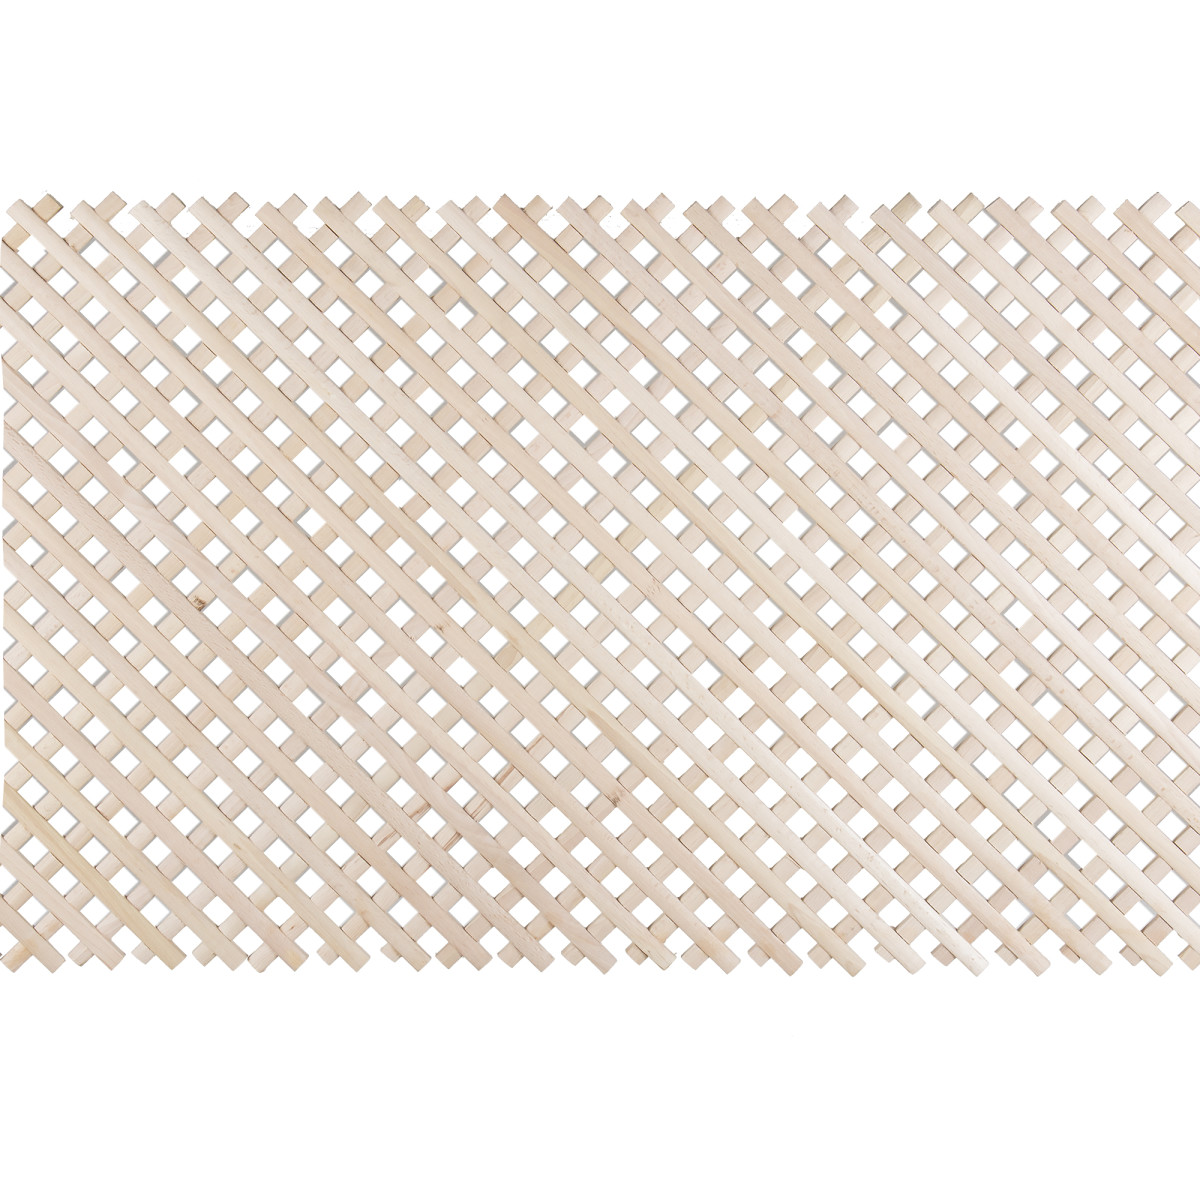 Решетка декоративная 50x200 см цвет бук